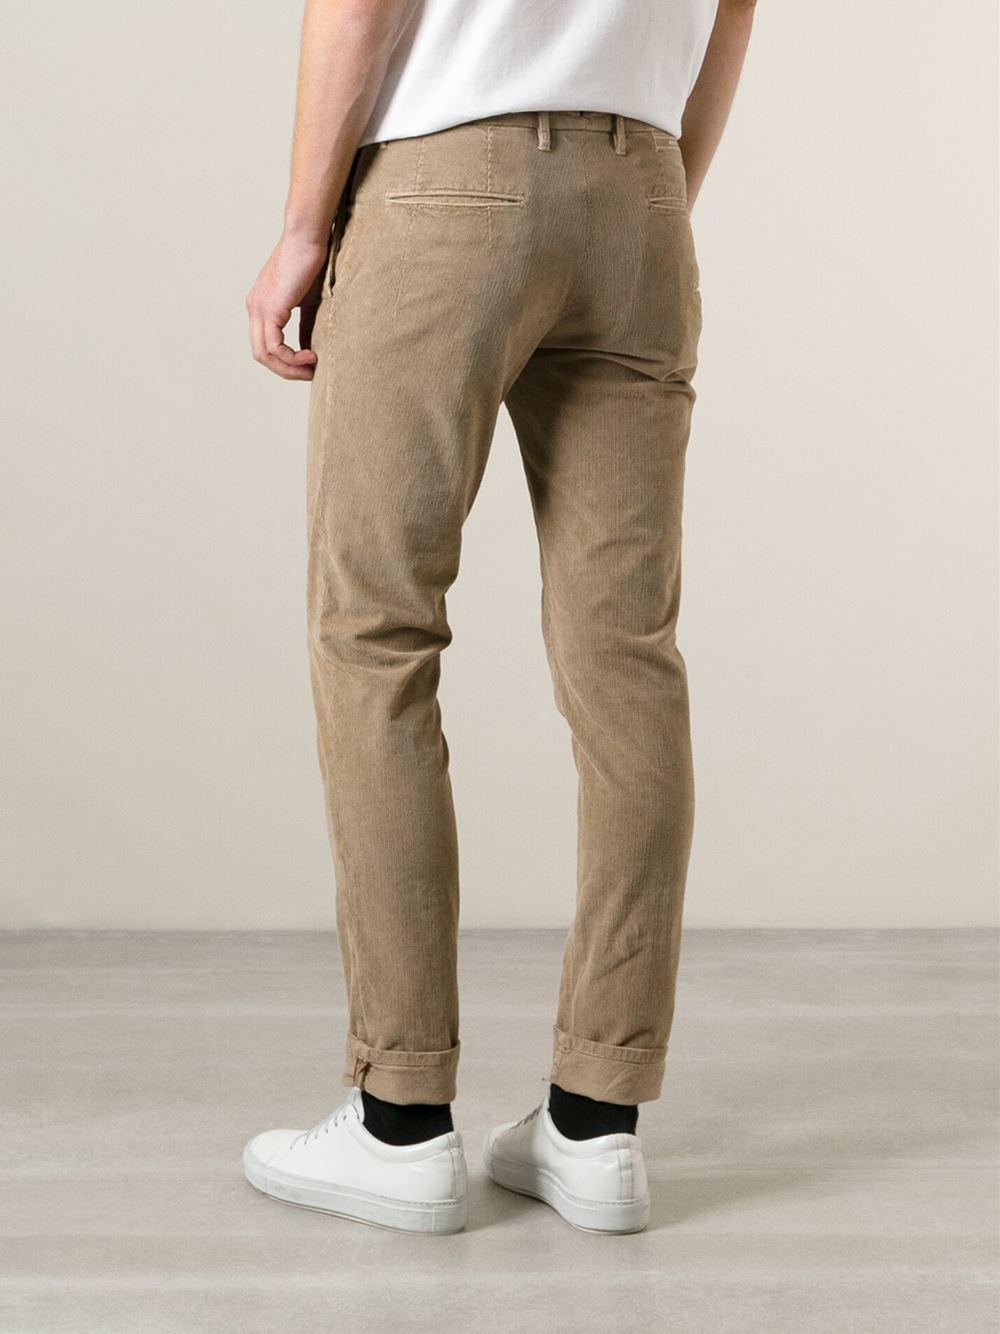 Pantalon Chino Slim-fit - Incotex Bleu MAOyGhF